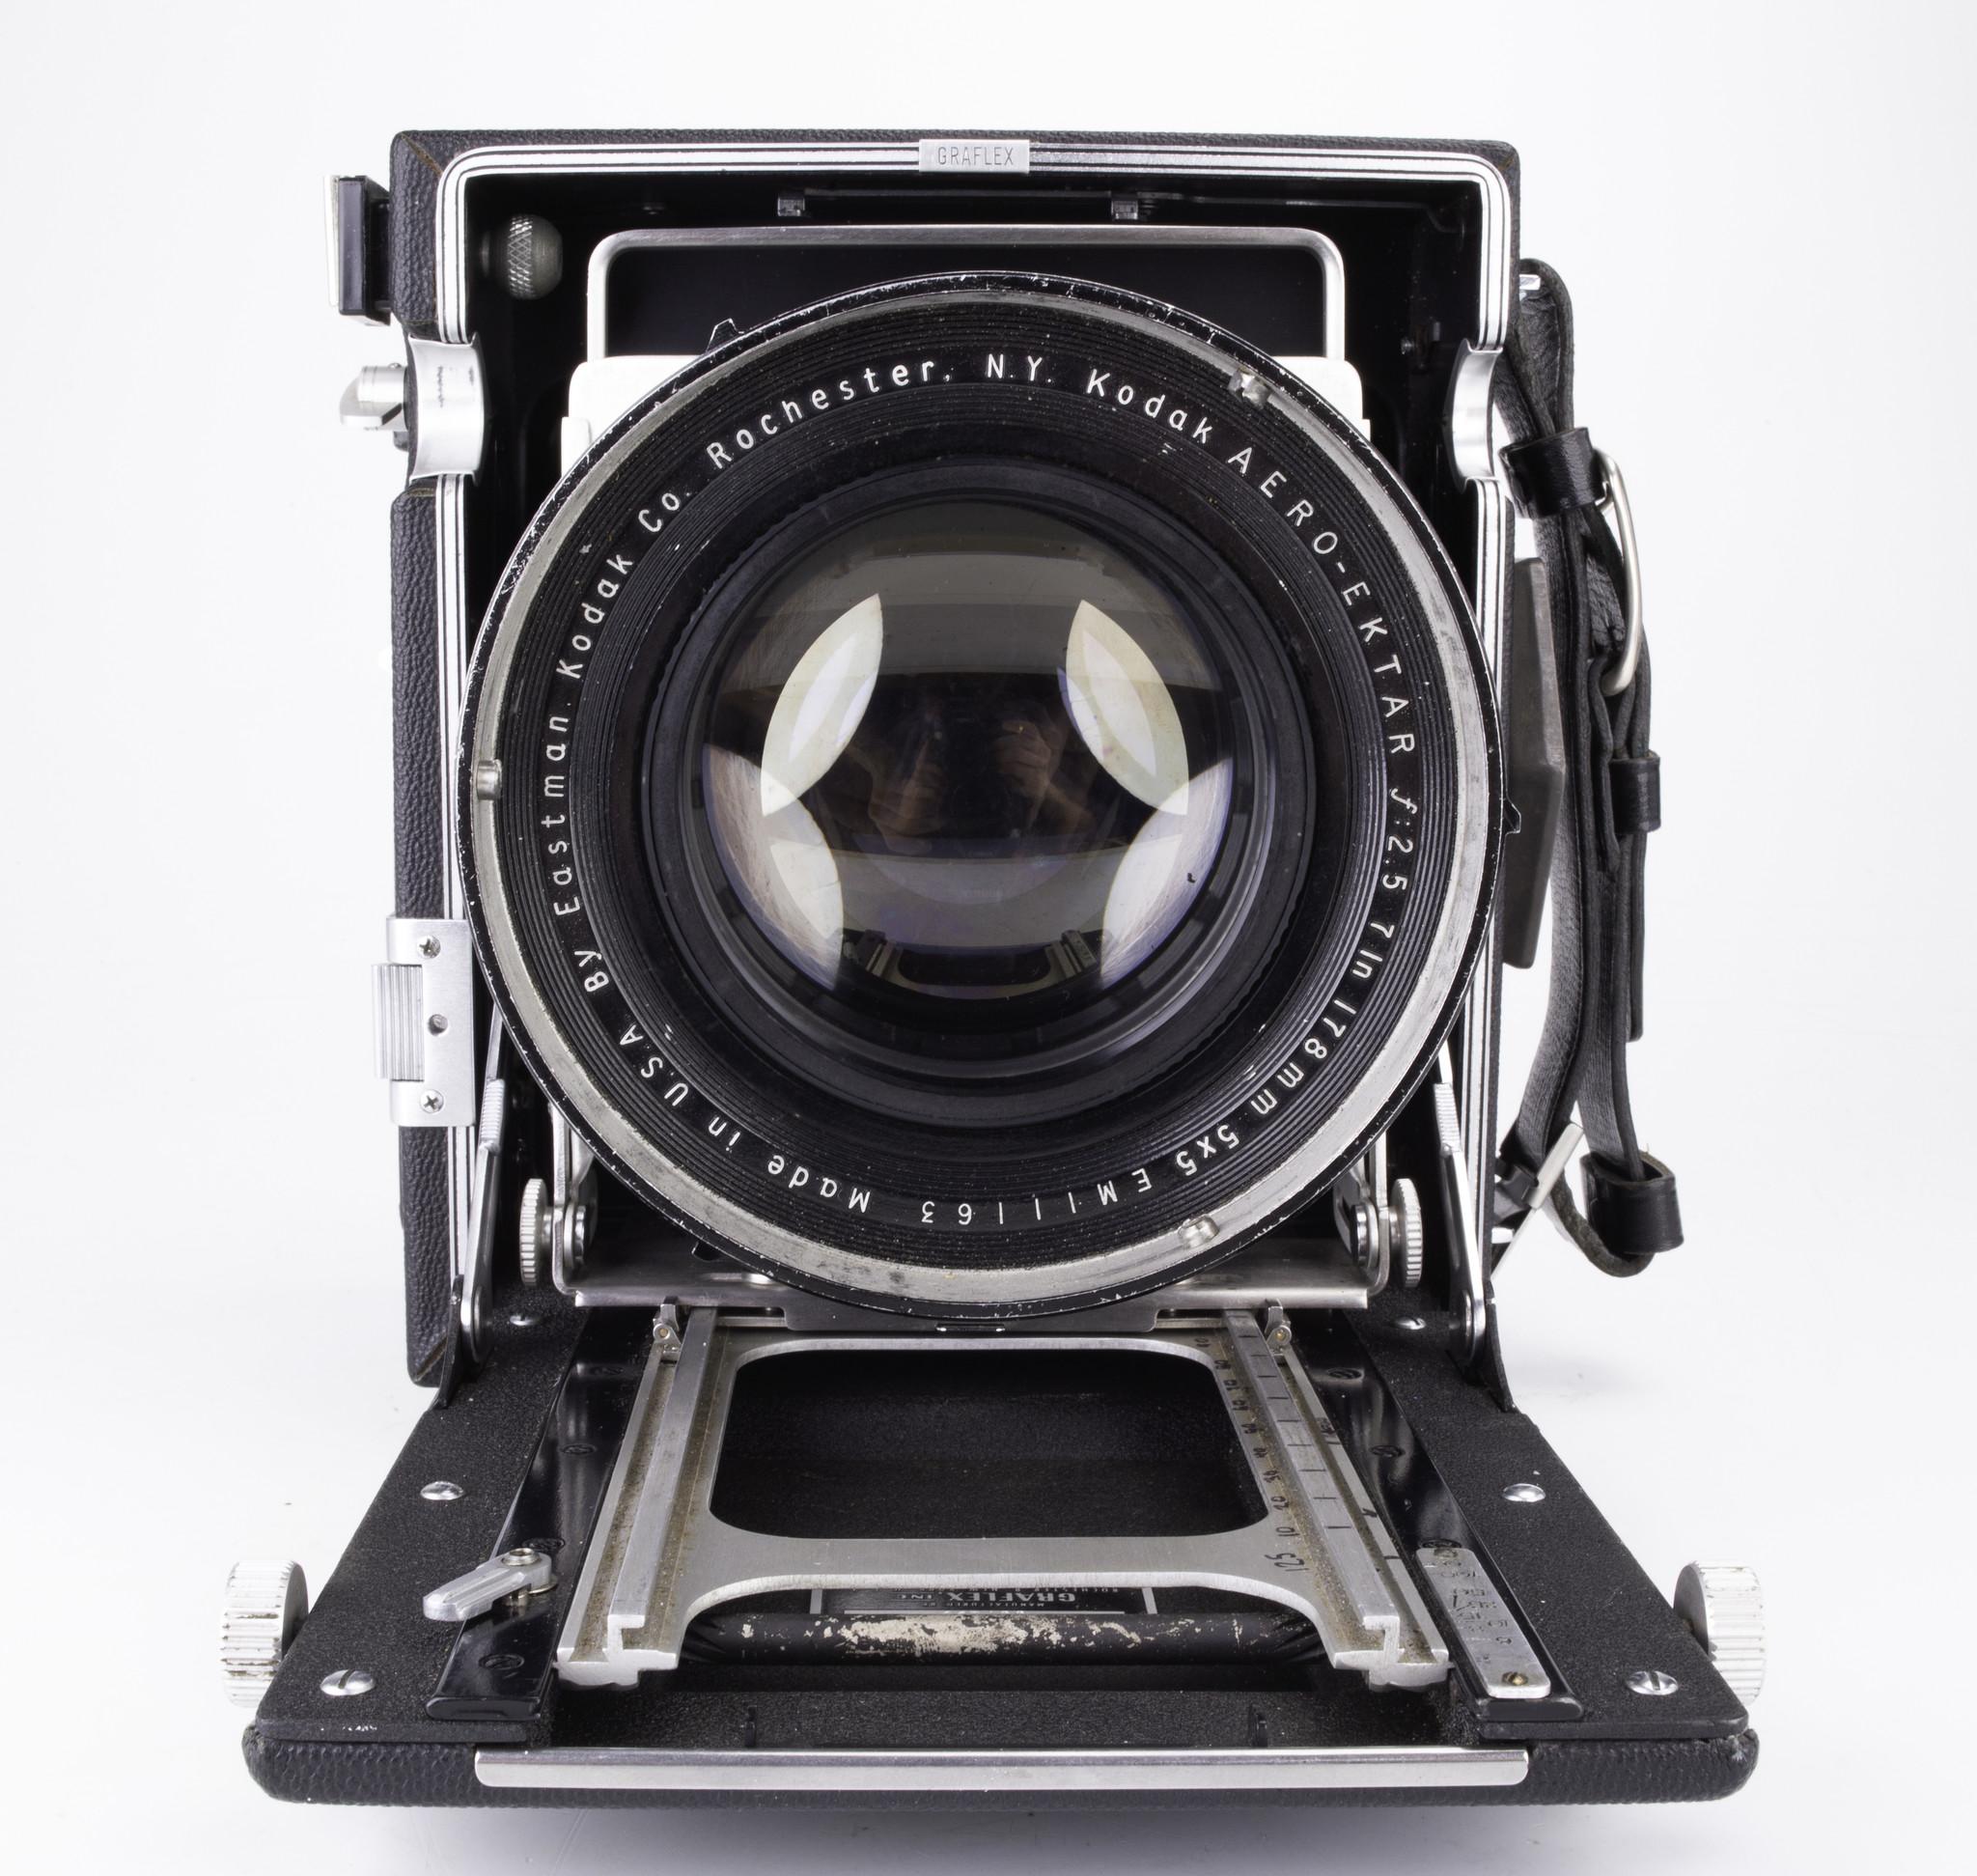 Kodak 178mm Aero Ektar f/2.5 Lens on Speed Graphic